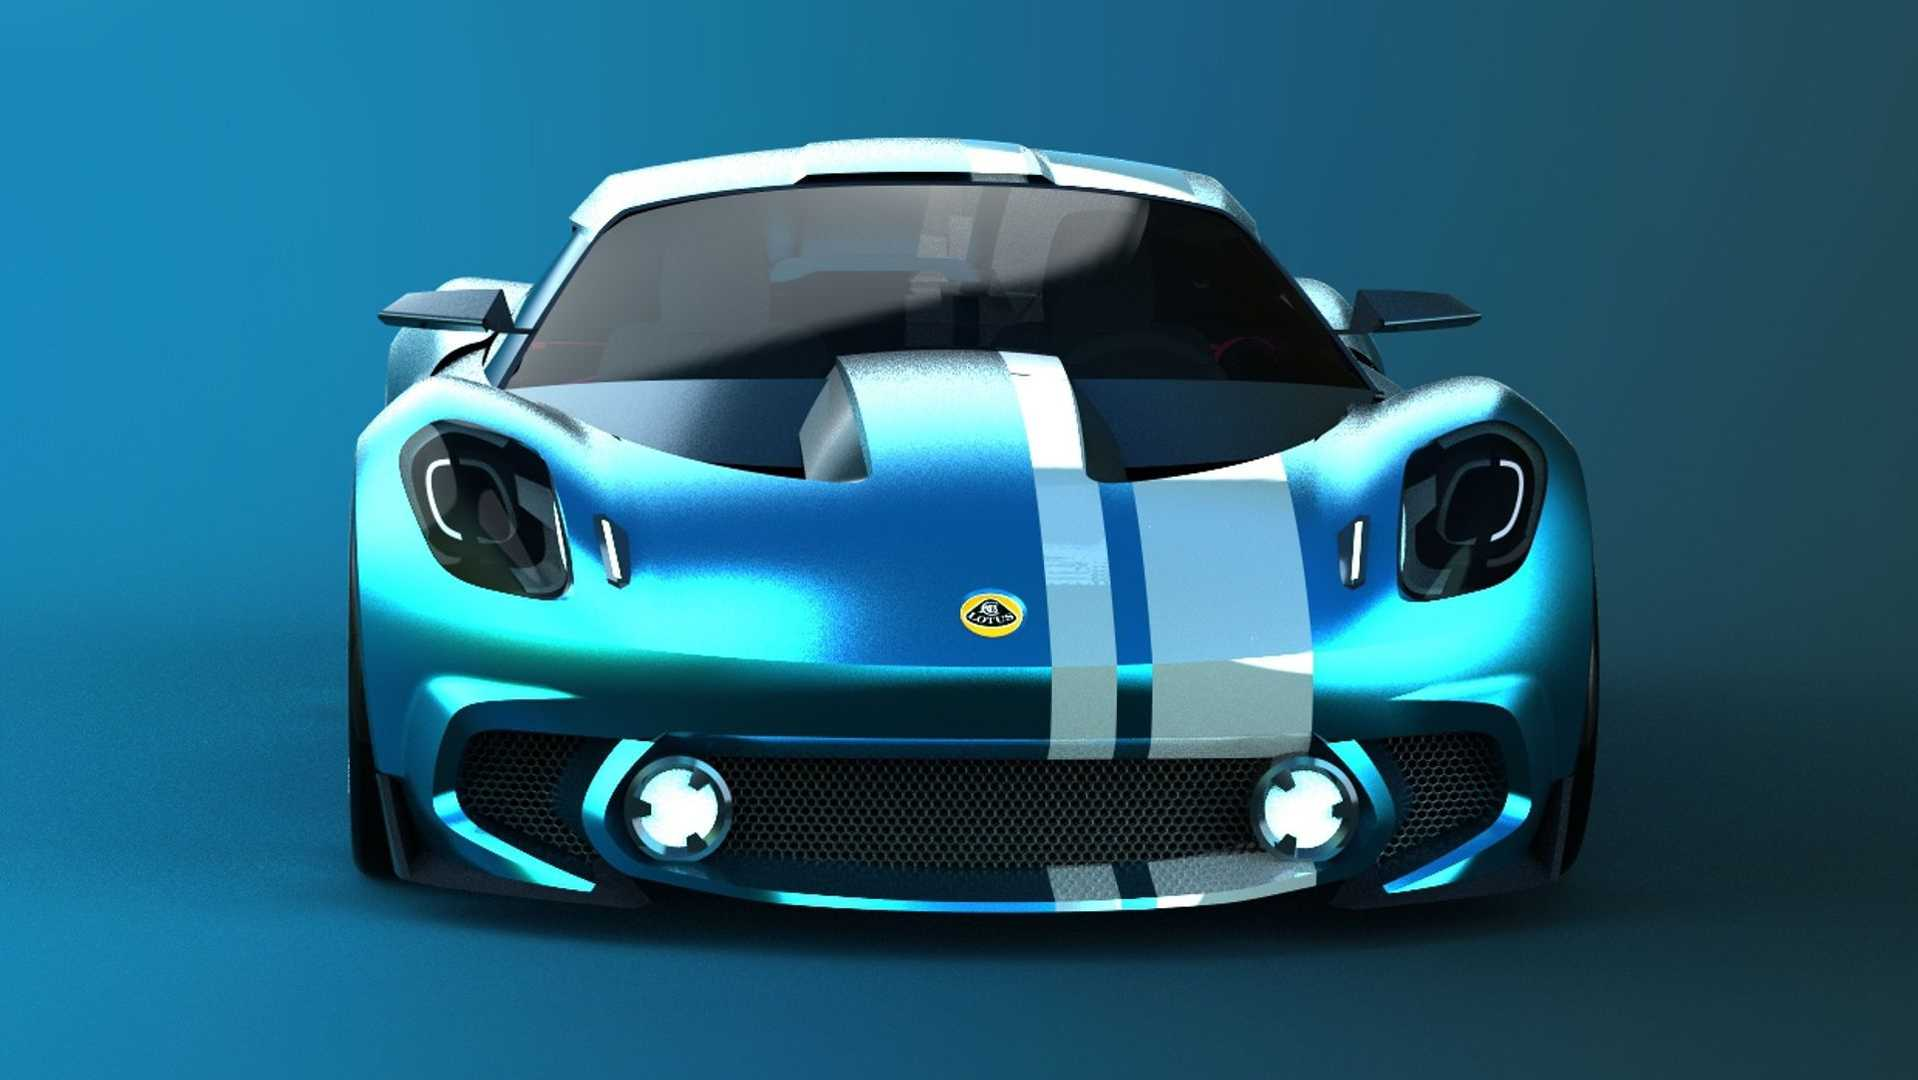 2020 Lotus Elise Render Begs To Be Noticed By New Owner Geely